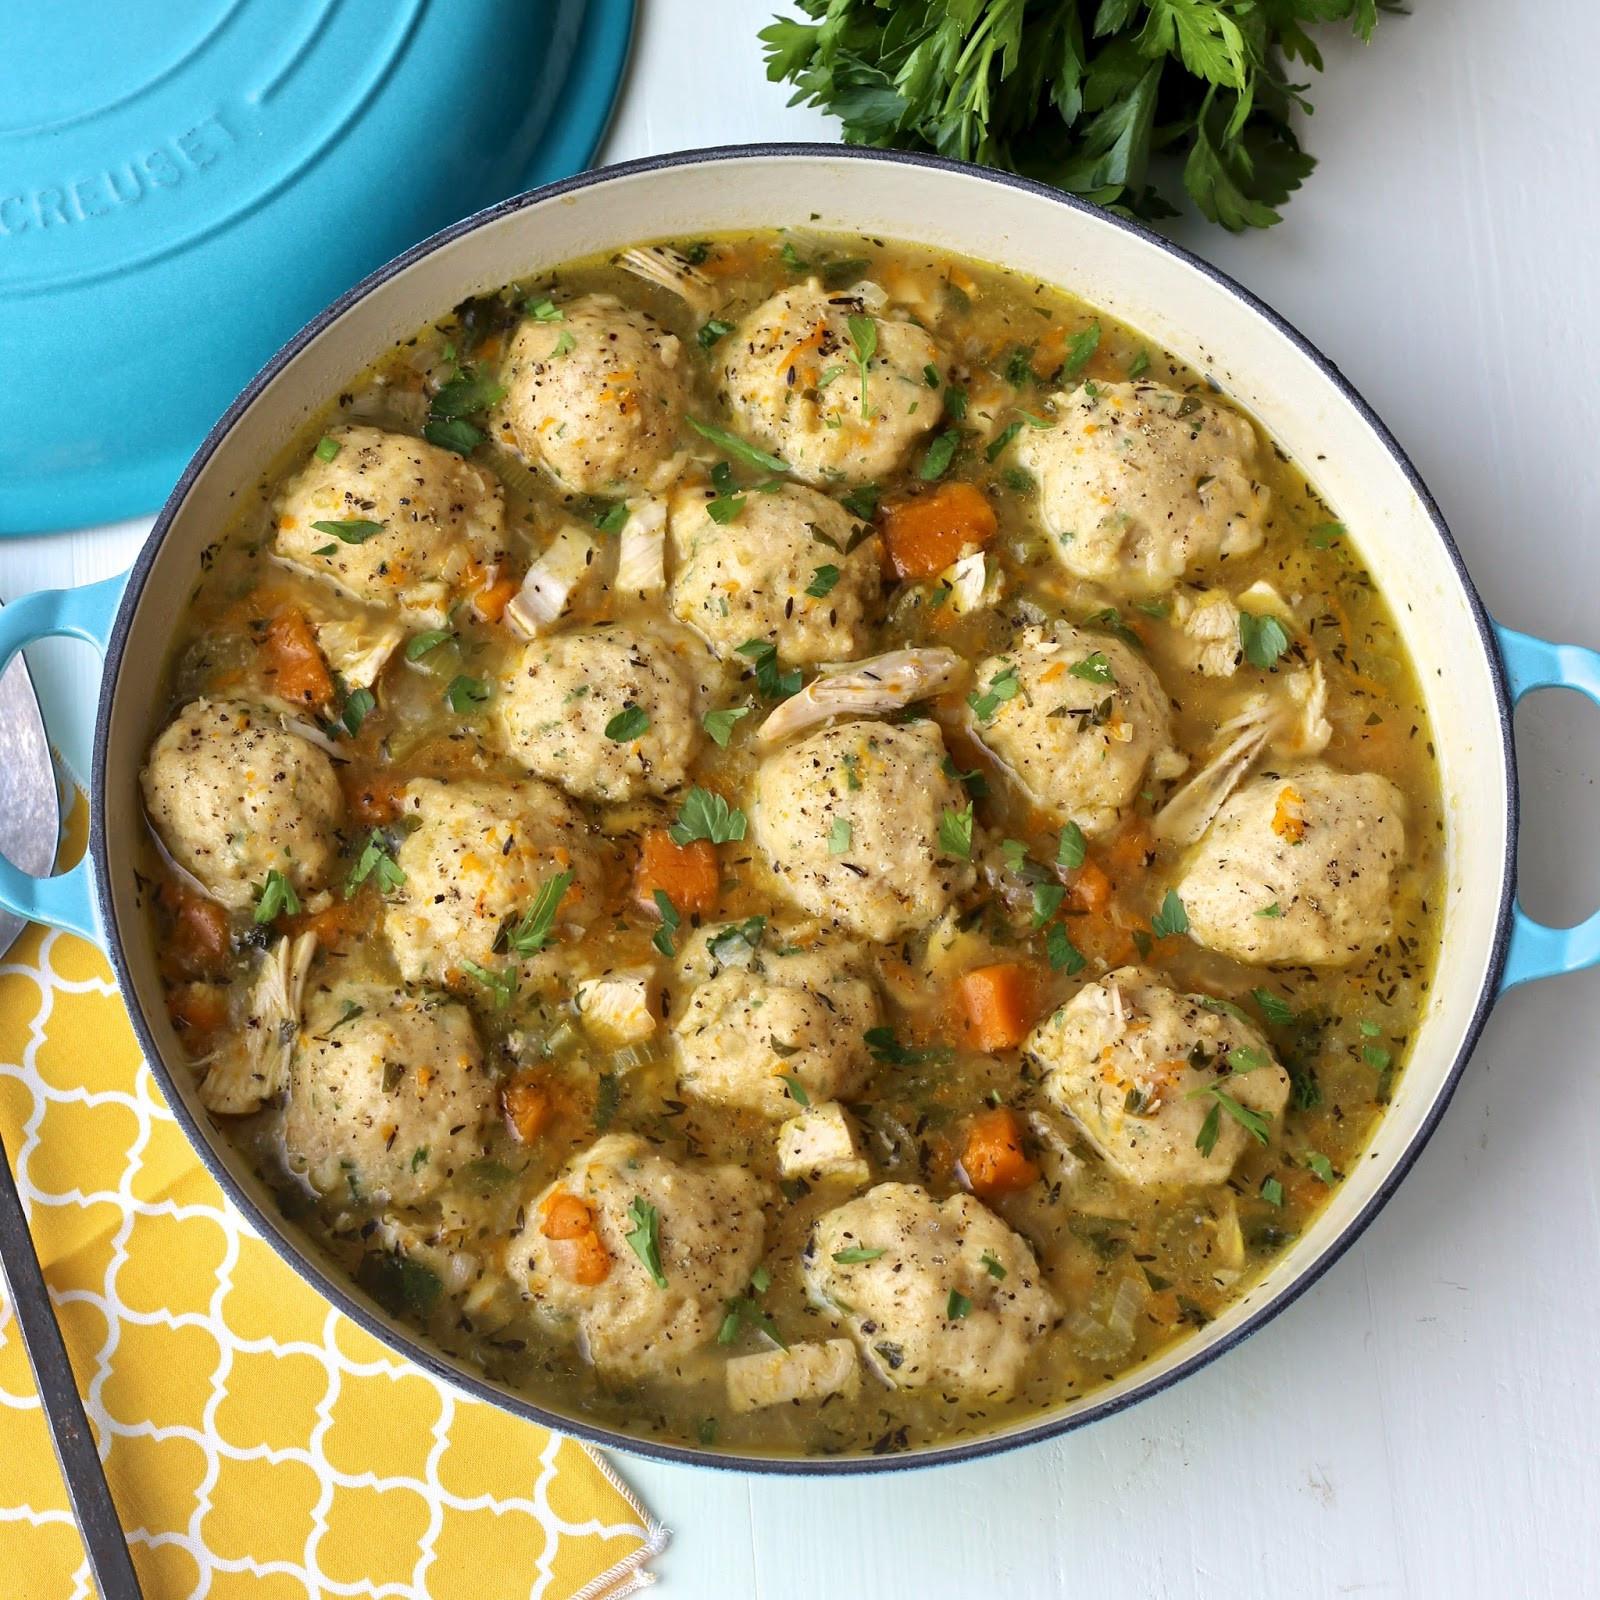 Recipe For Chicken And Dumplings  Recipe Resuscitation Chicken and Dumplings